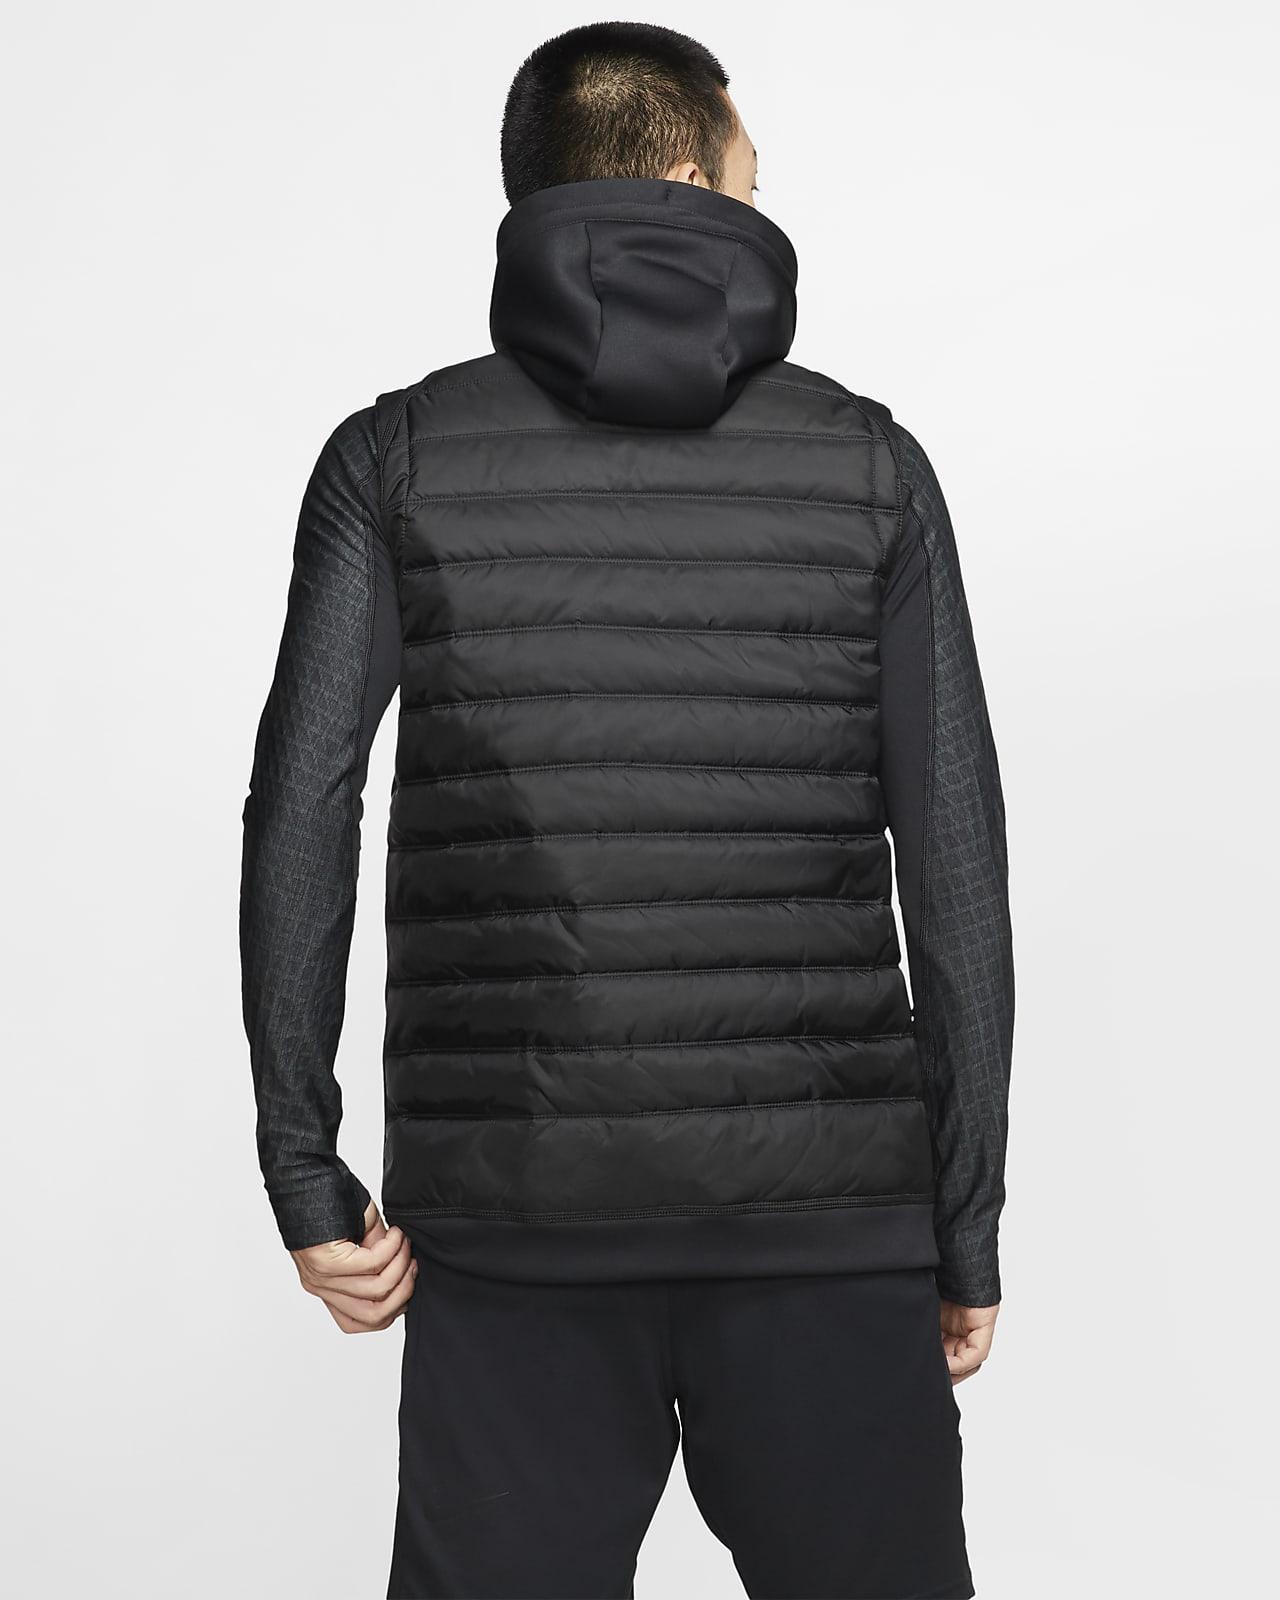 Winterized Full-Zip Training Gilet. Nike NL